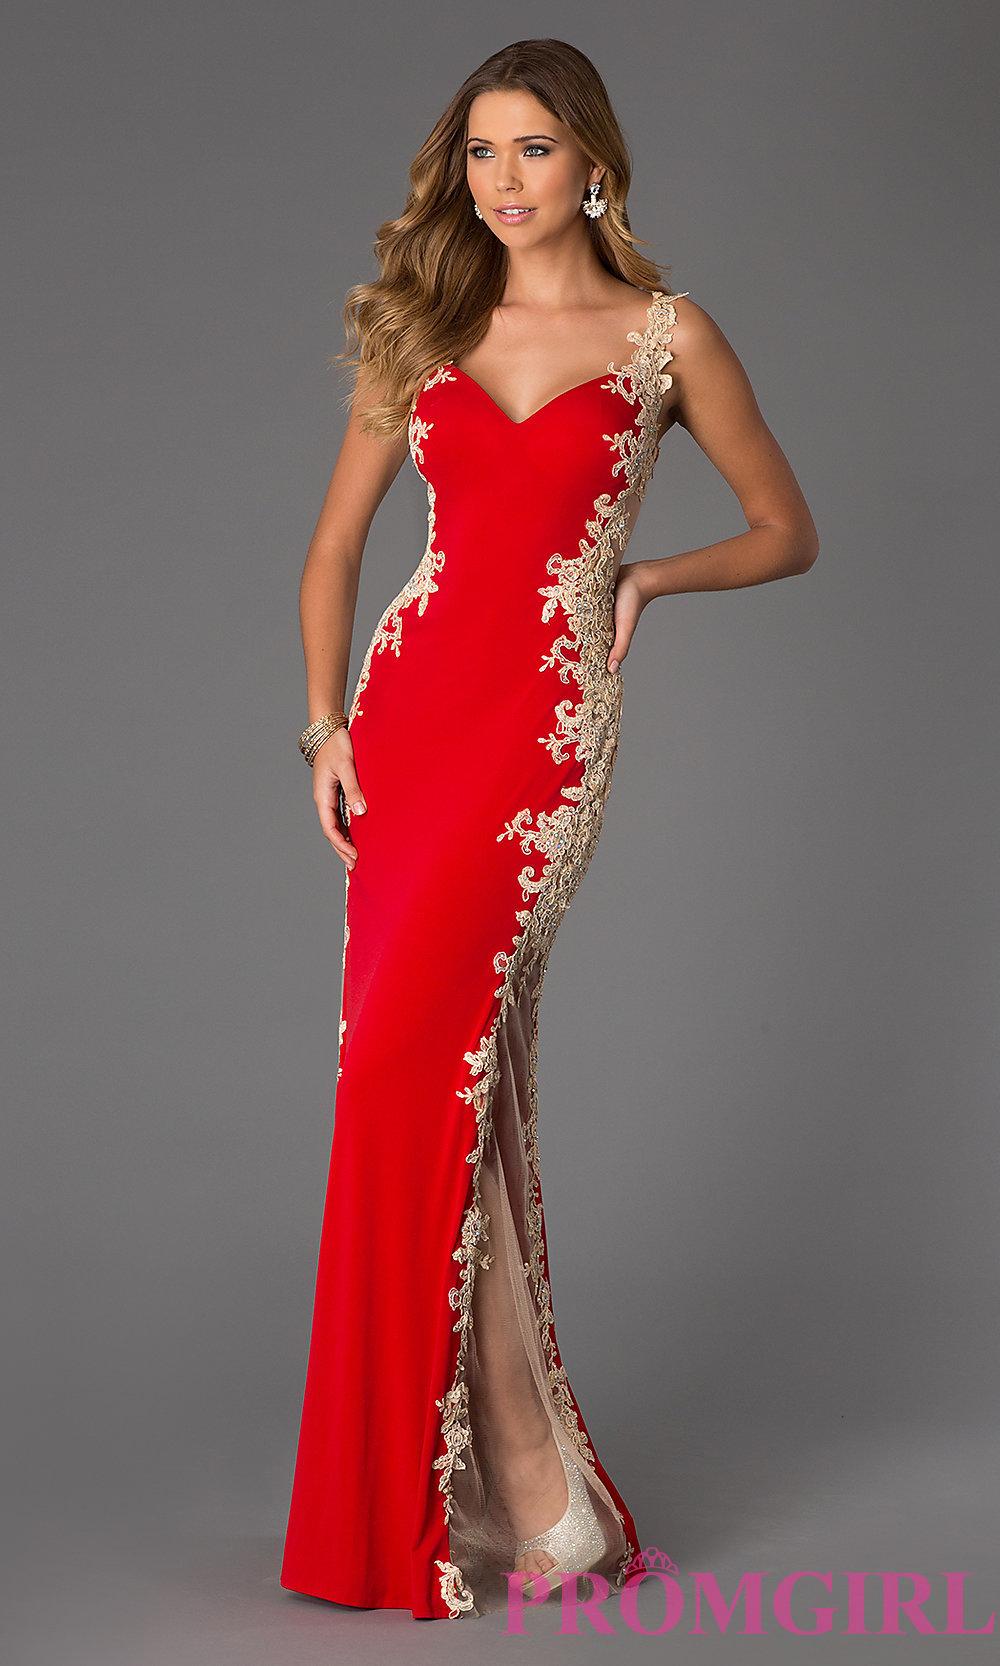 7e6ae017d5ad2 Jovani Long Sleeve Evening Gown | Huston Fislar Photography